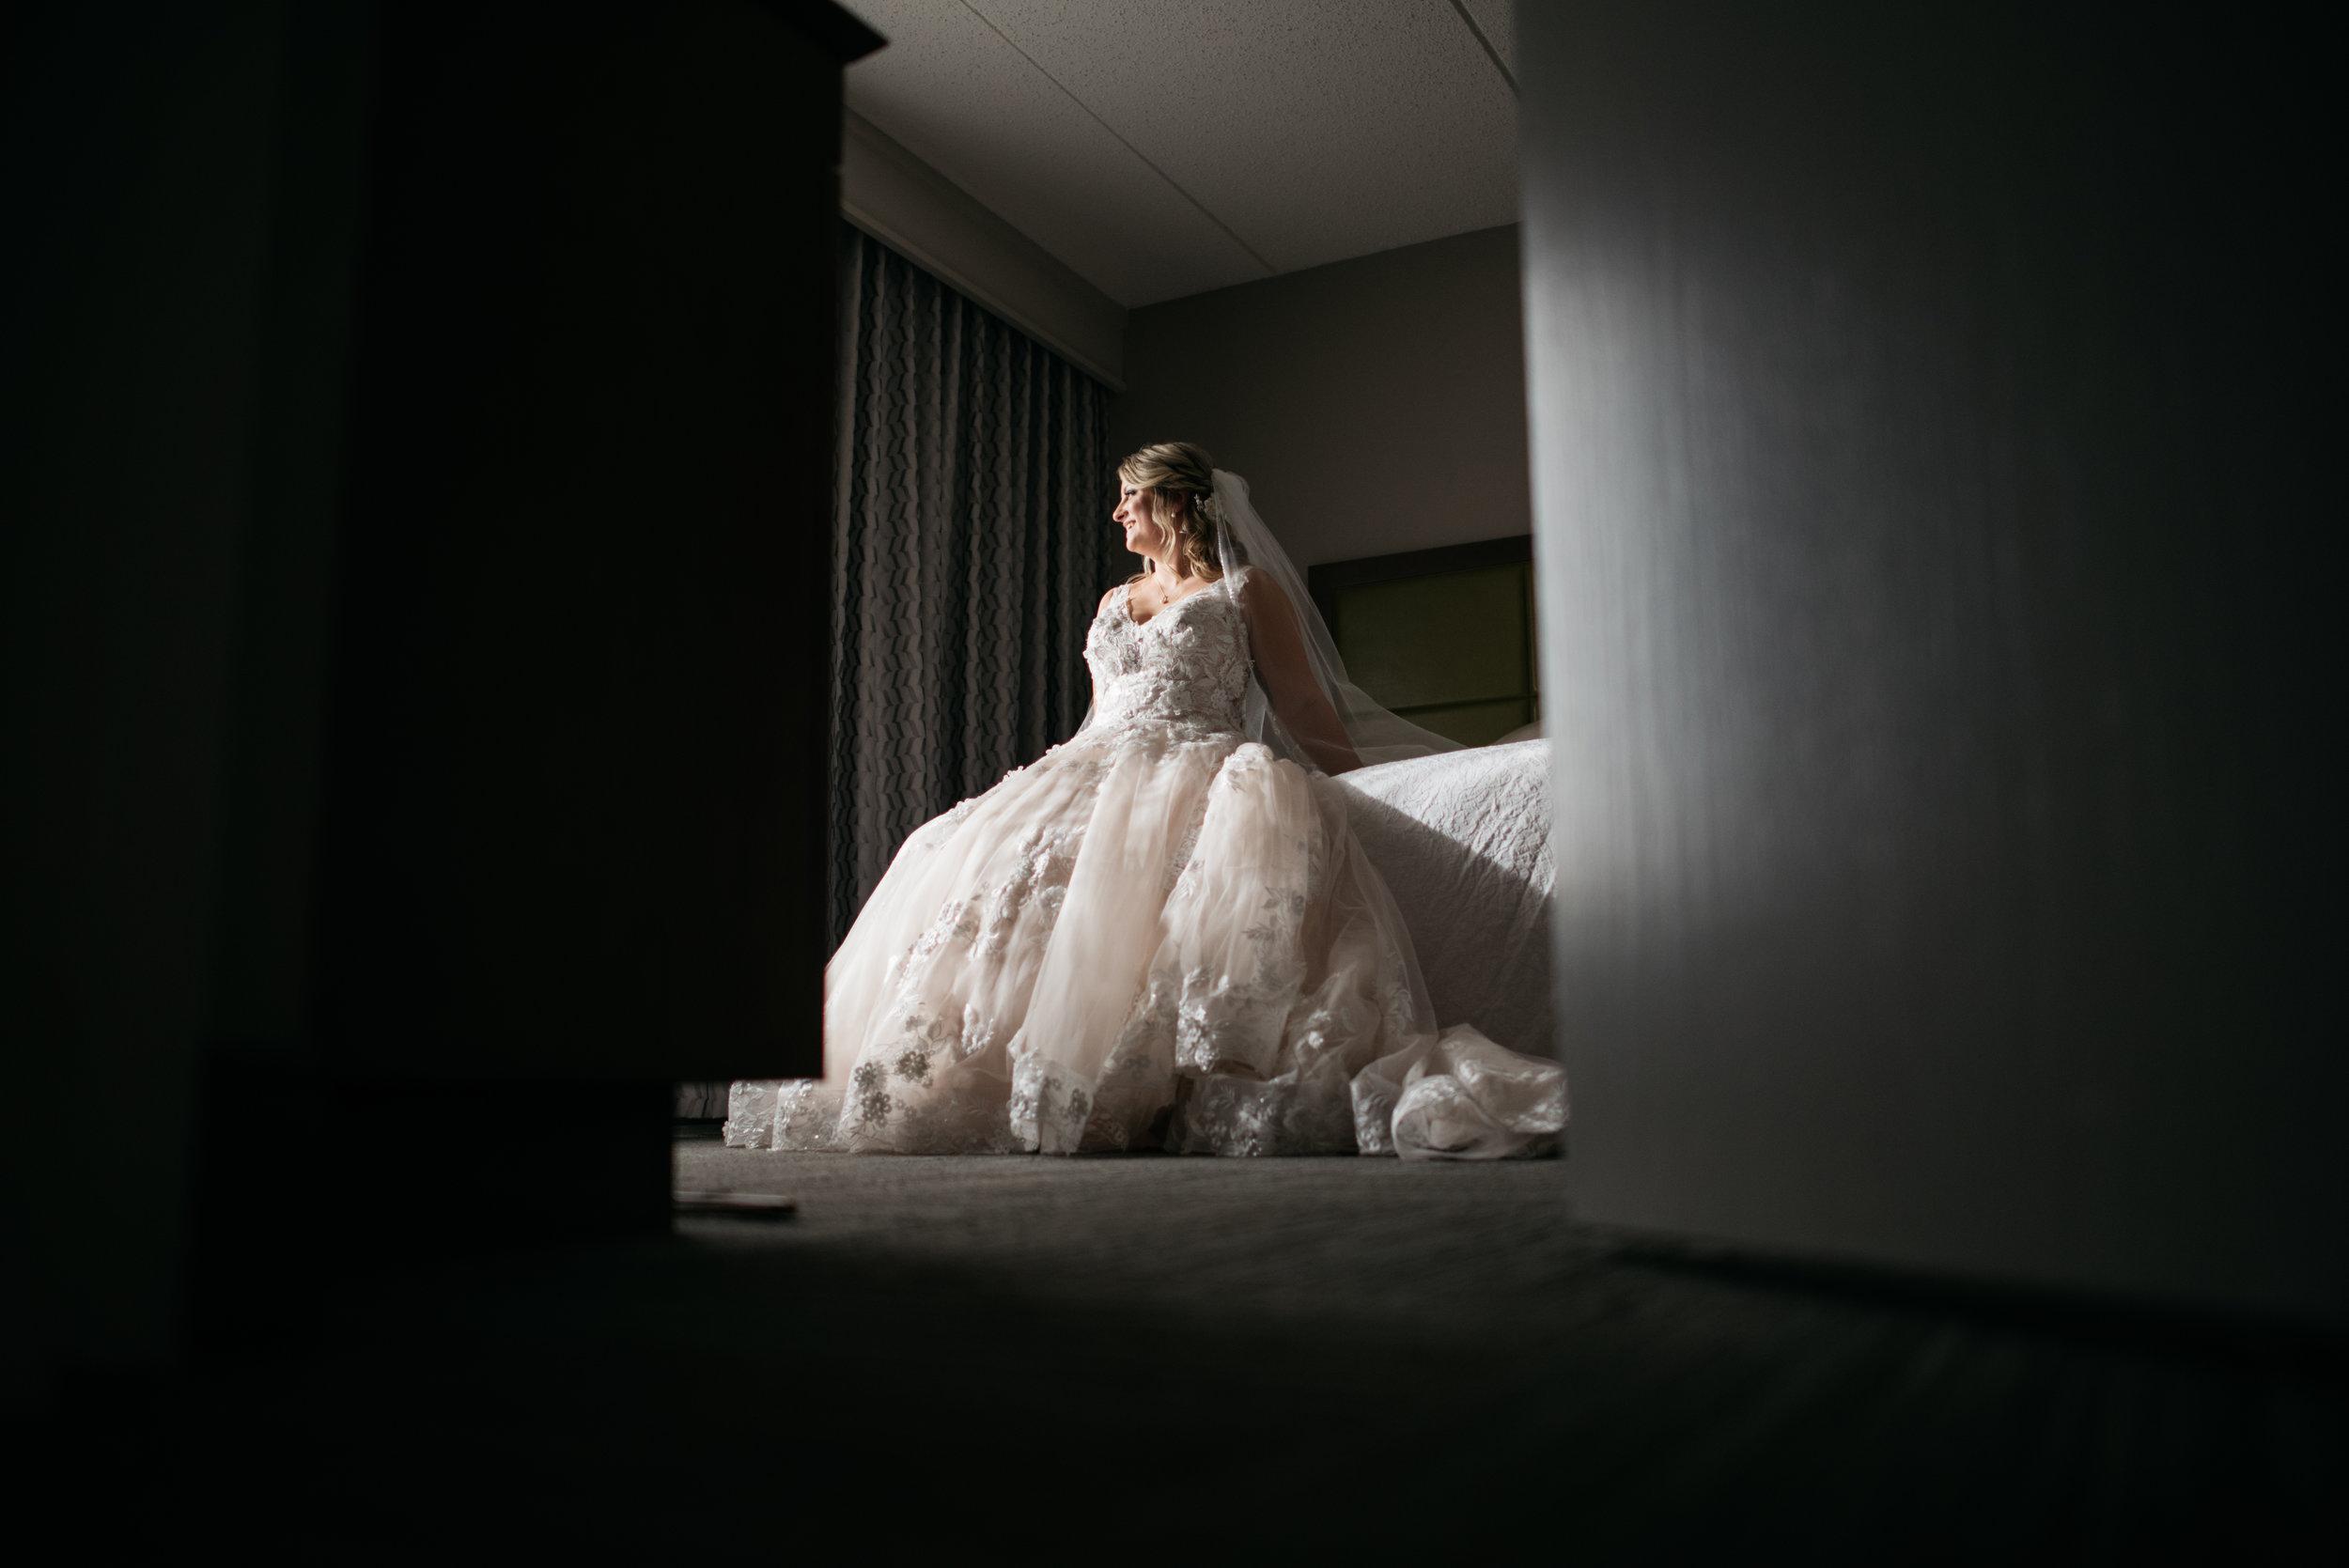 WeddingPhotos | NJPhotographer | Highlights-8-33.jpg